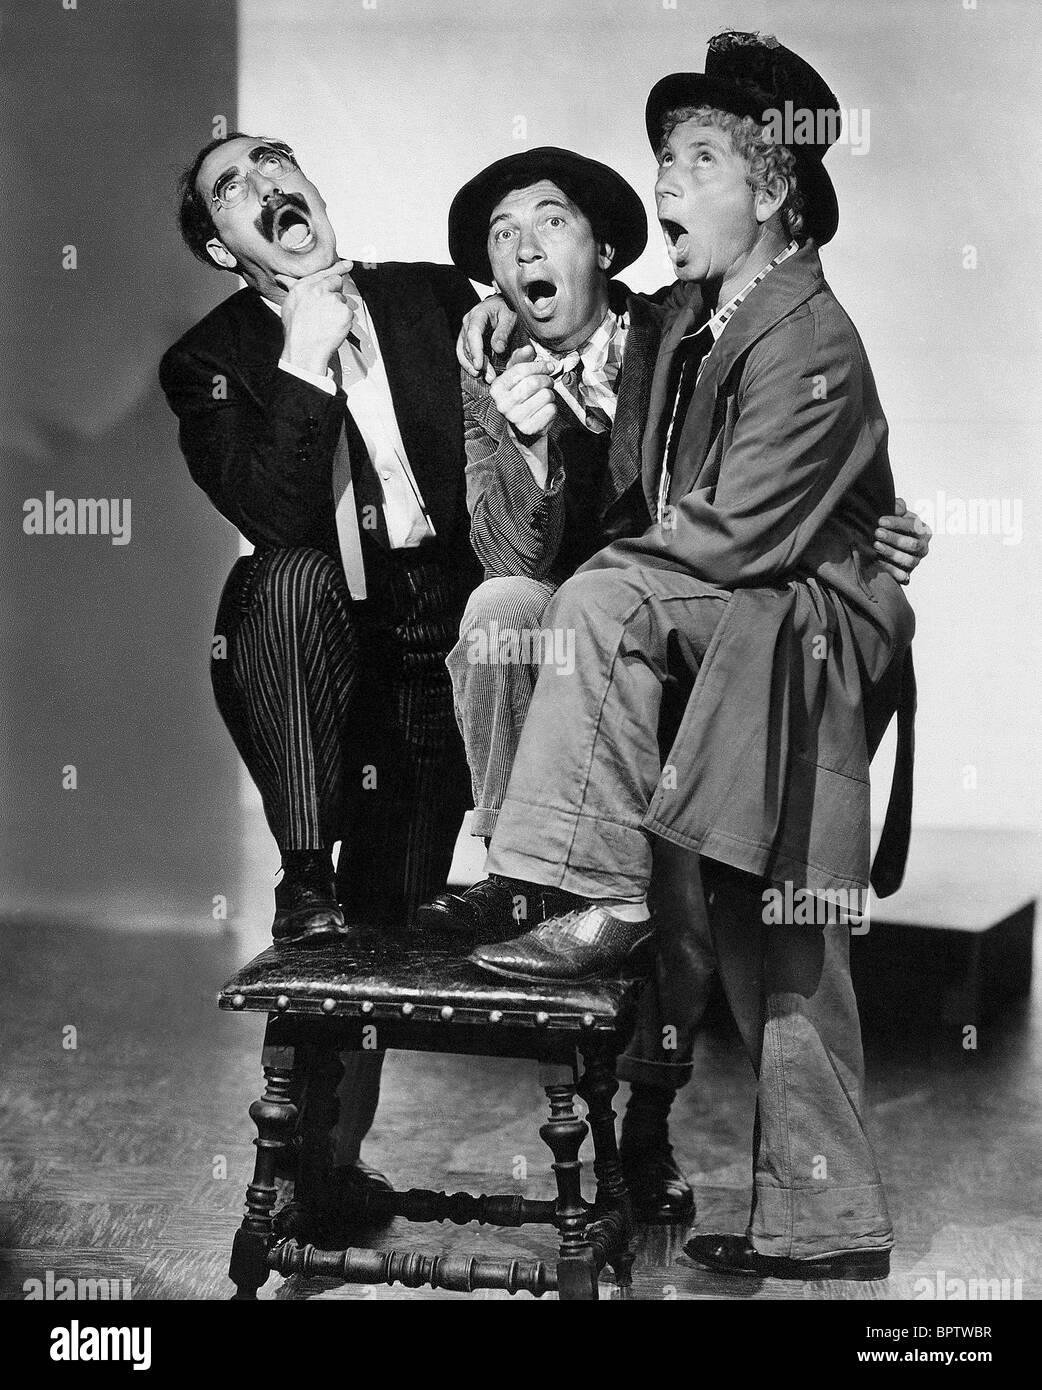 Groucho Marx Chico Marx Amp Harpo Marx The Marx Brothers